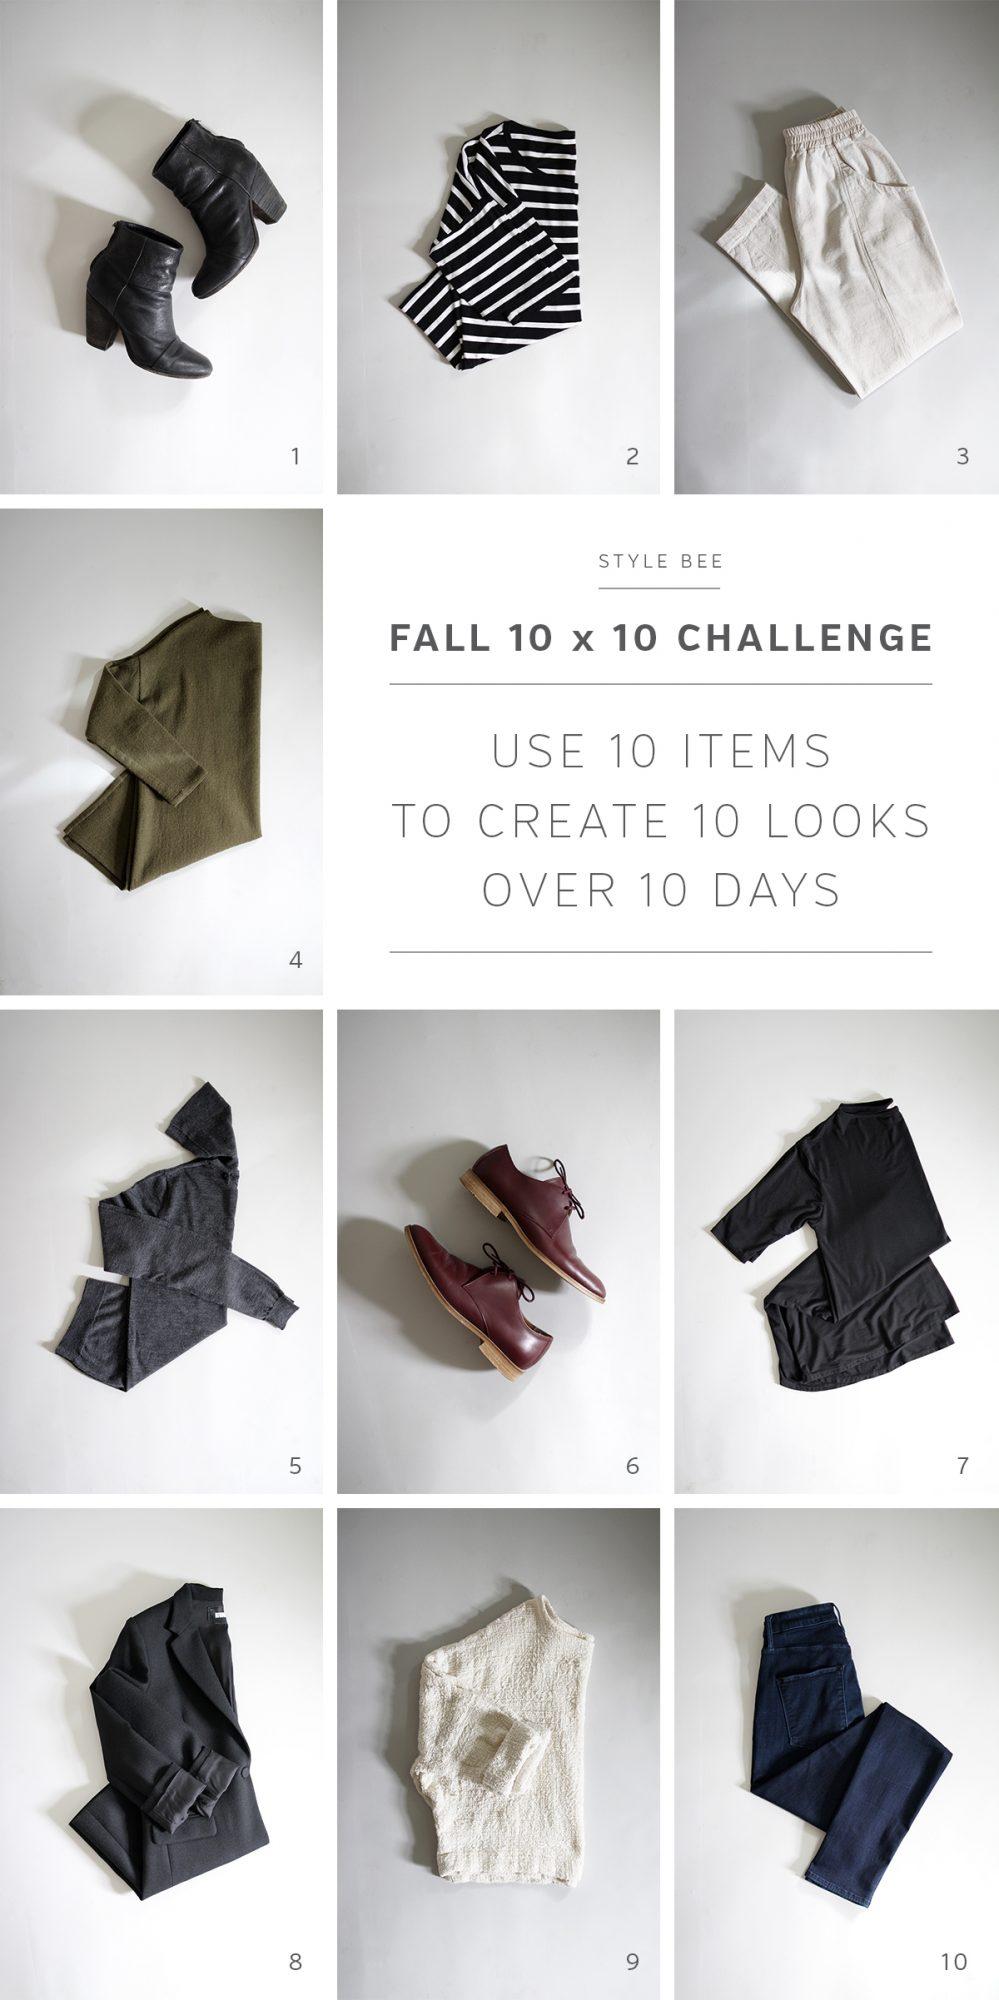 Style Bee - Fall 10 x 10 Challenge - 2016